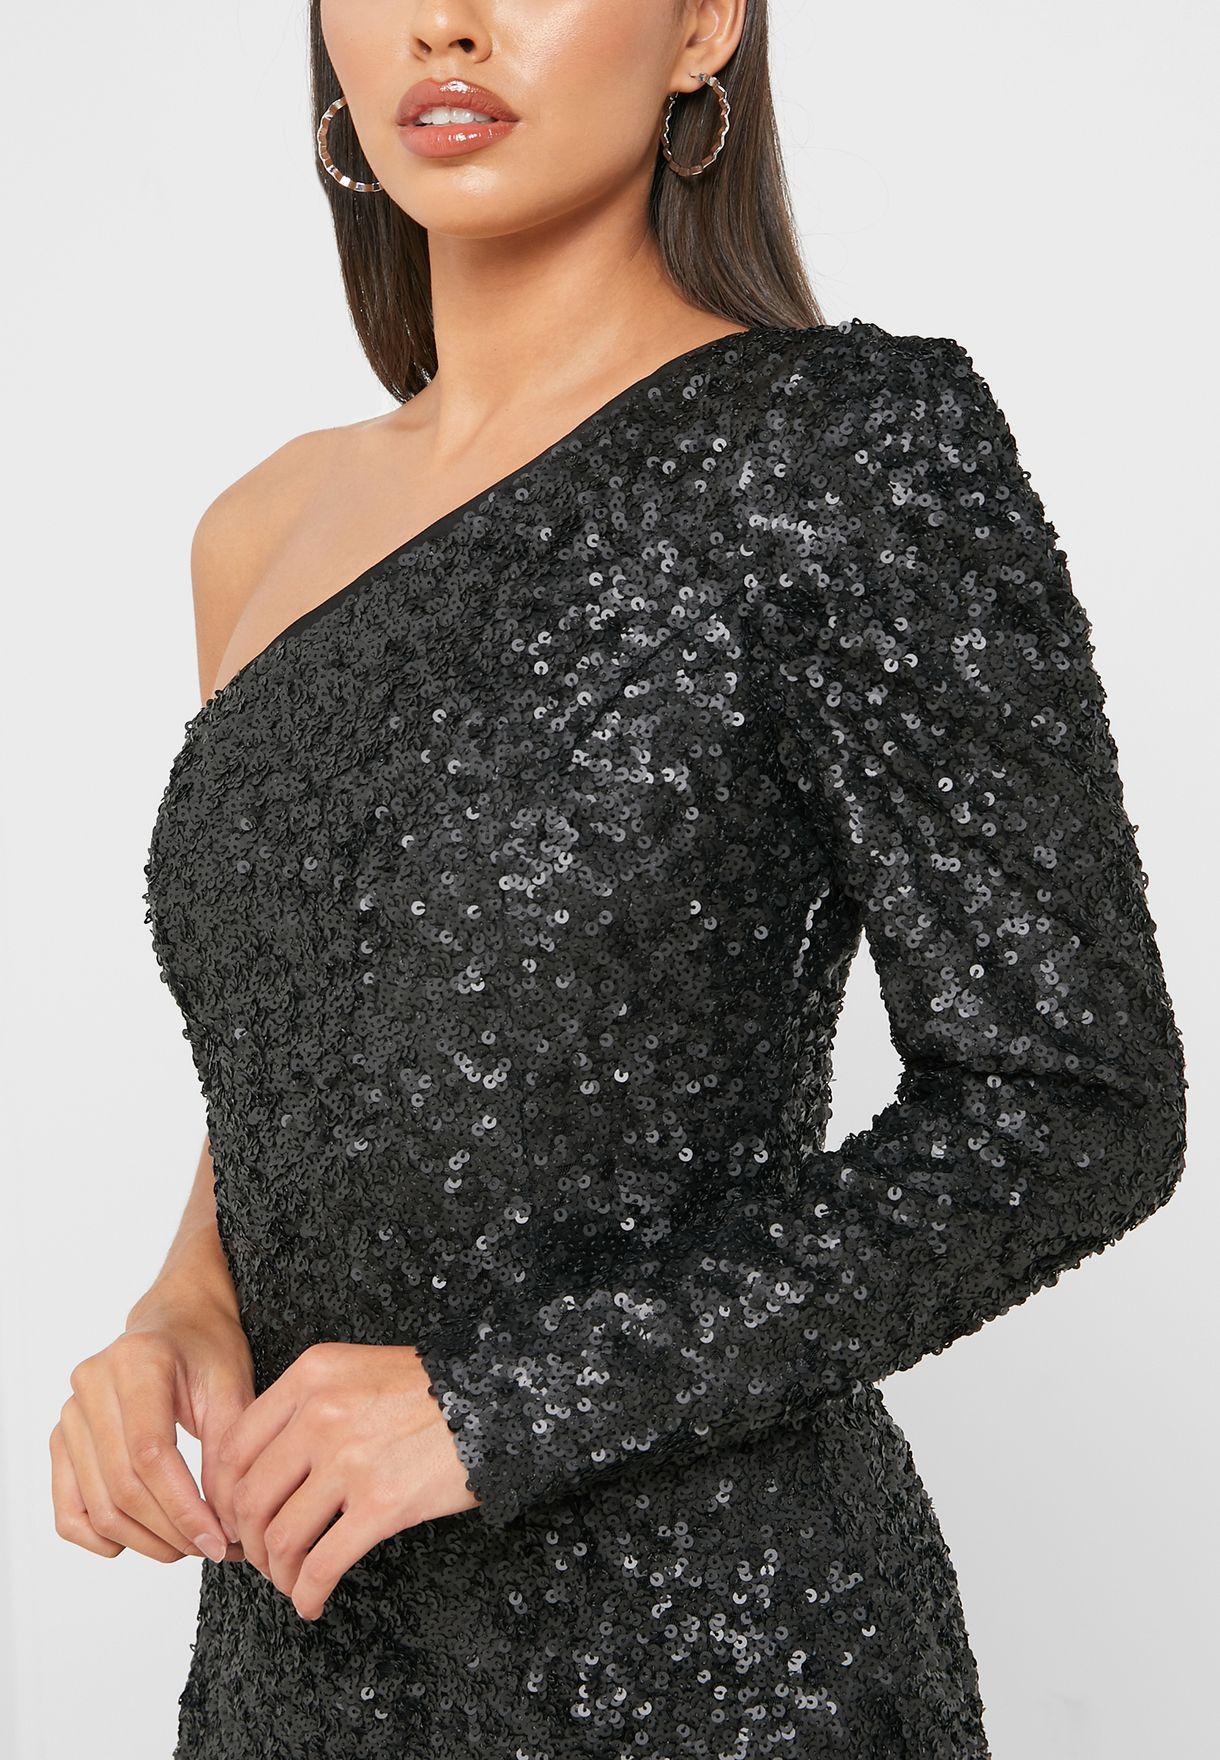 فستان بكتف واحد مزين بالترتر